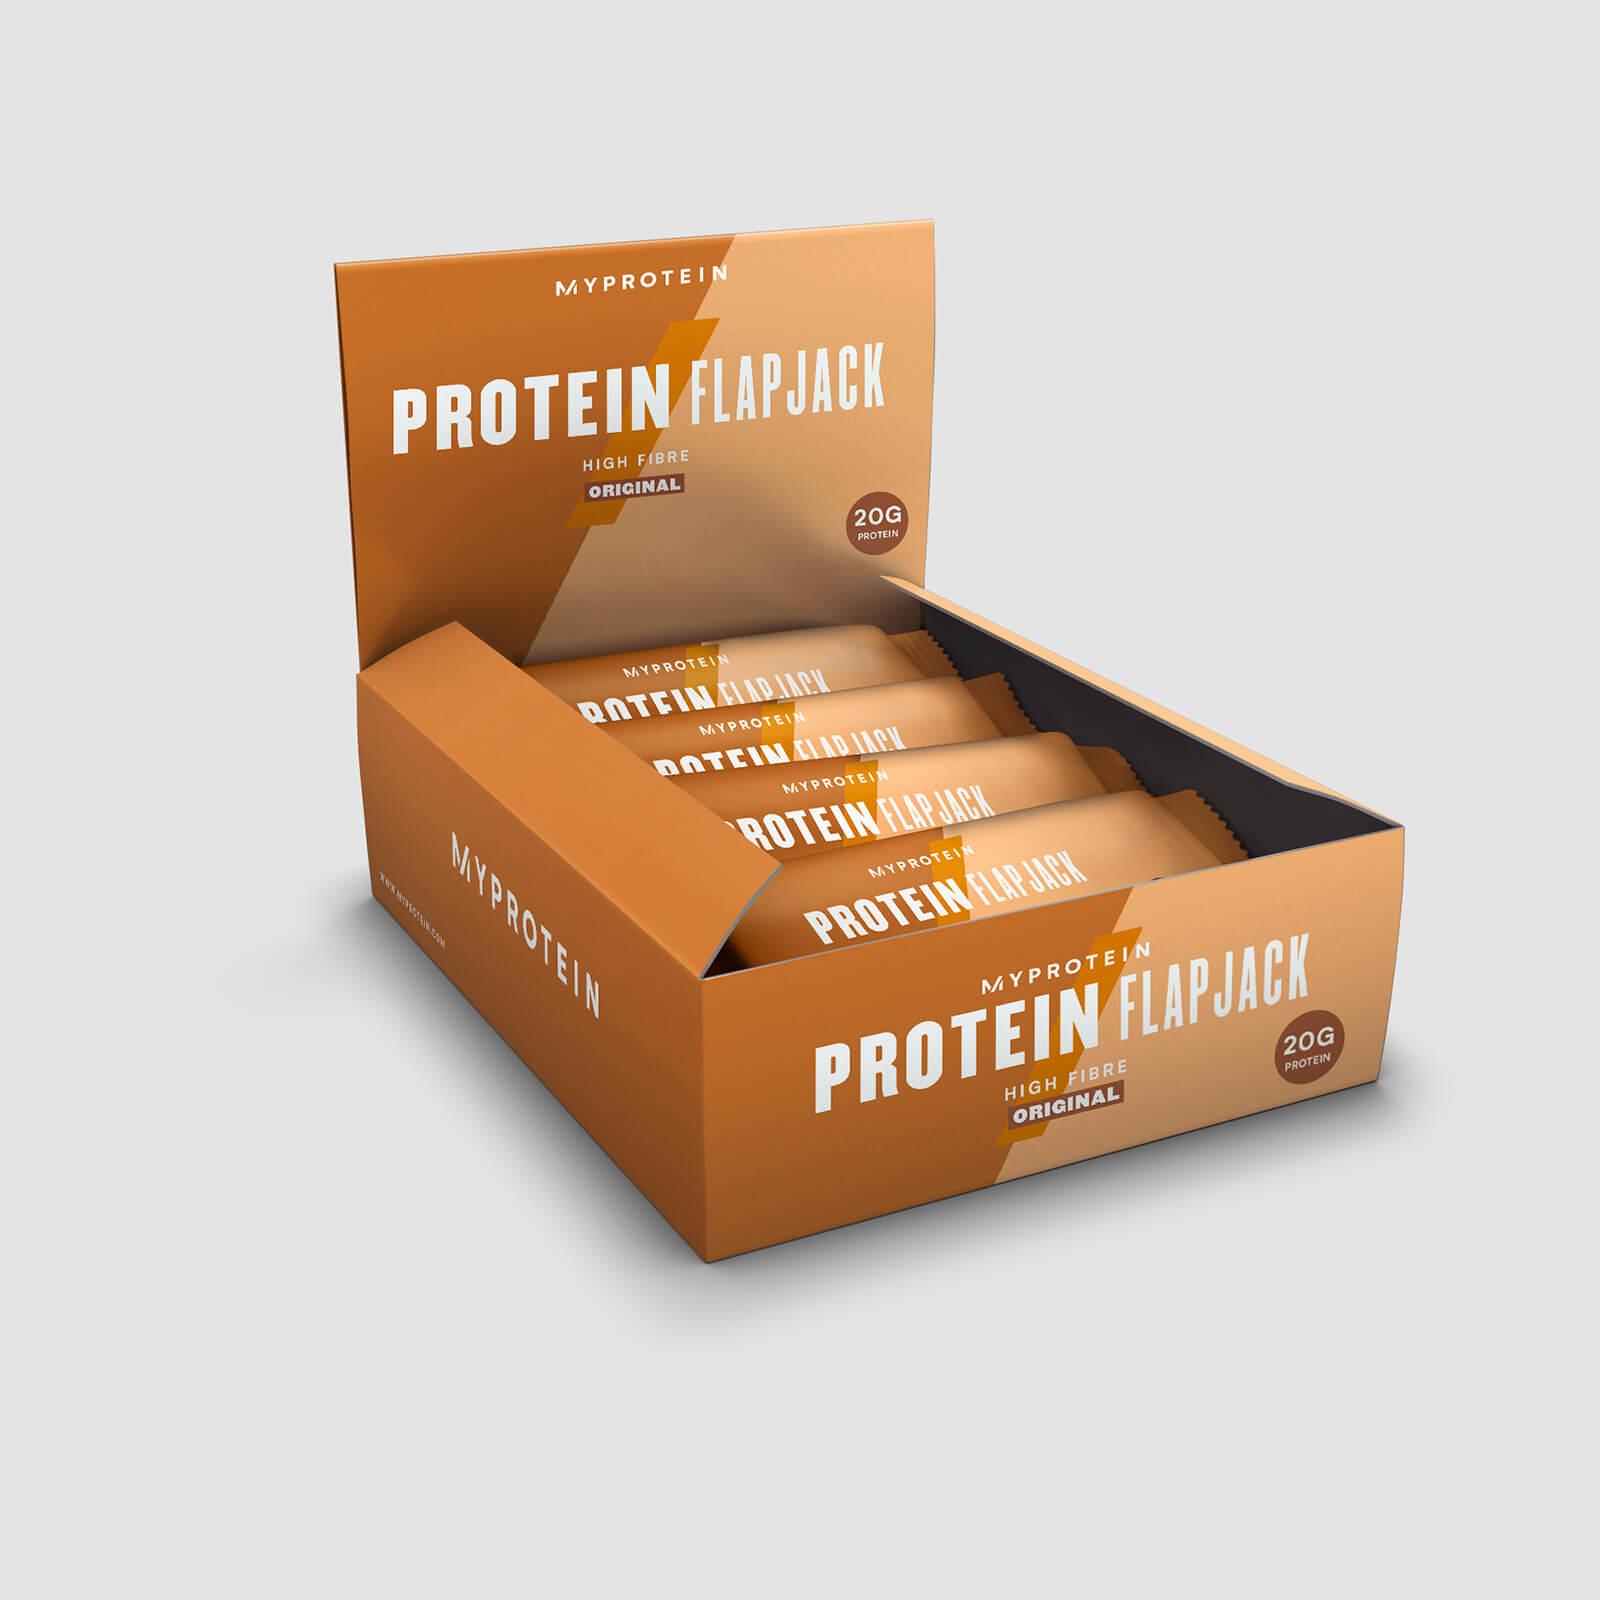 Myprotein Flapjack Protéiné - Original